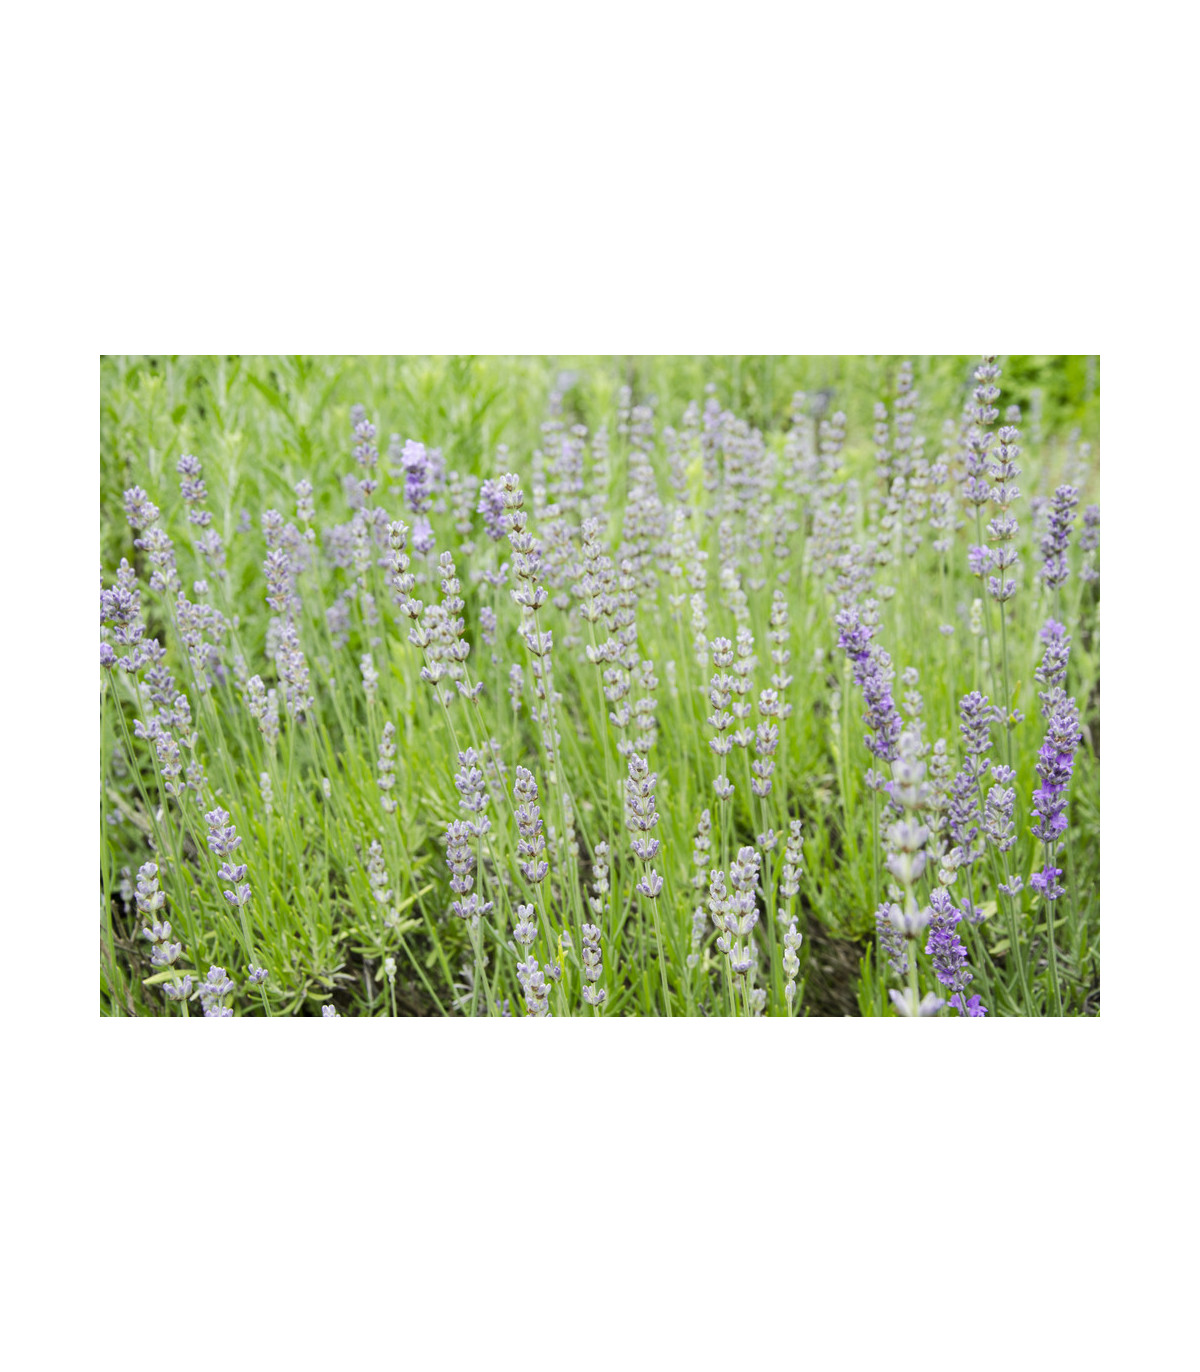 Levanduľa lekárska ružová ŠPECIÁL - Lavandula angustifolia - semená levandule - semiačka - 50 ks